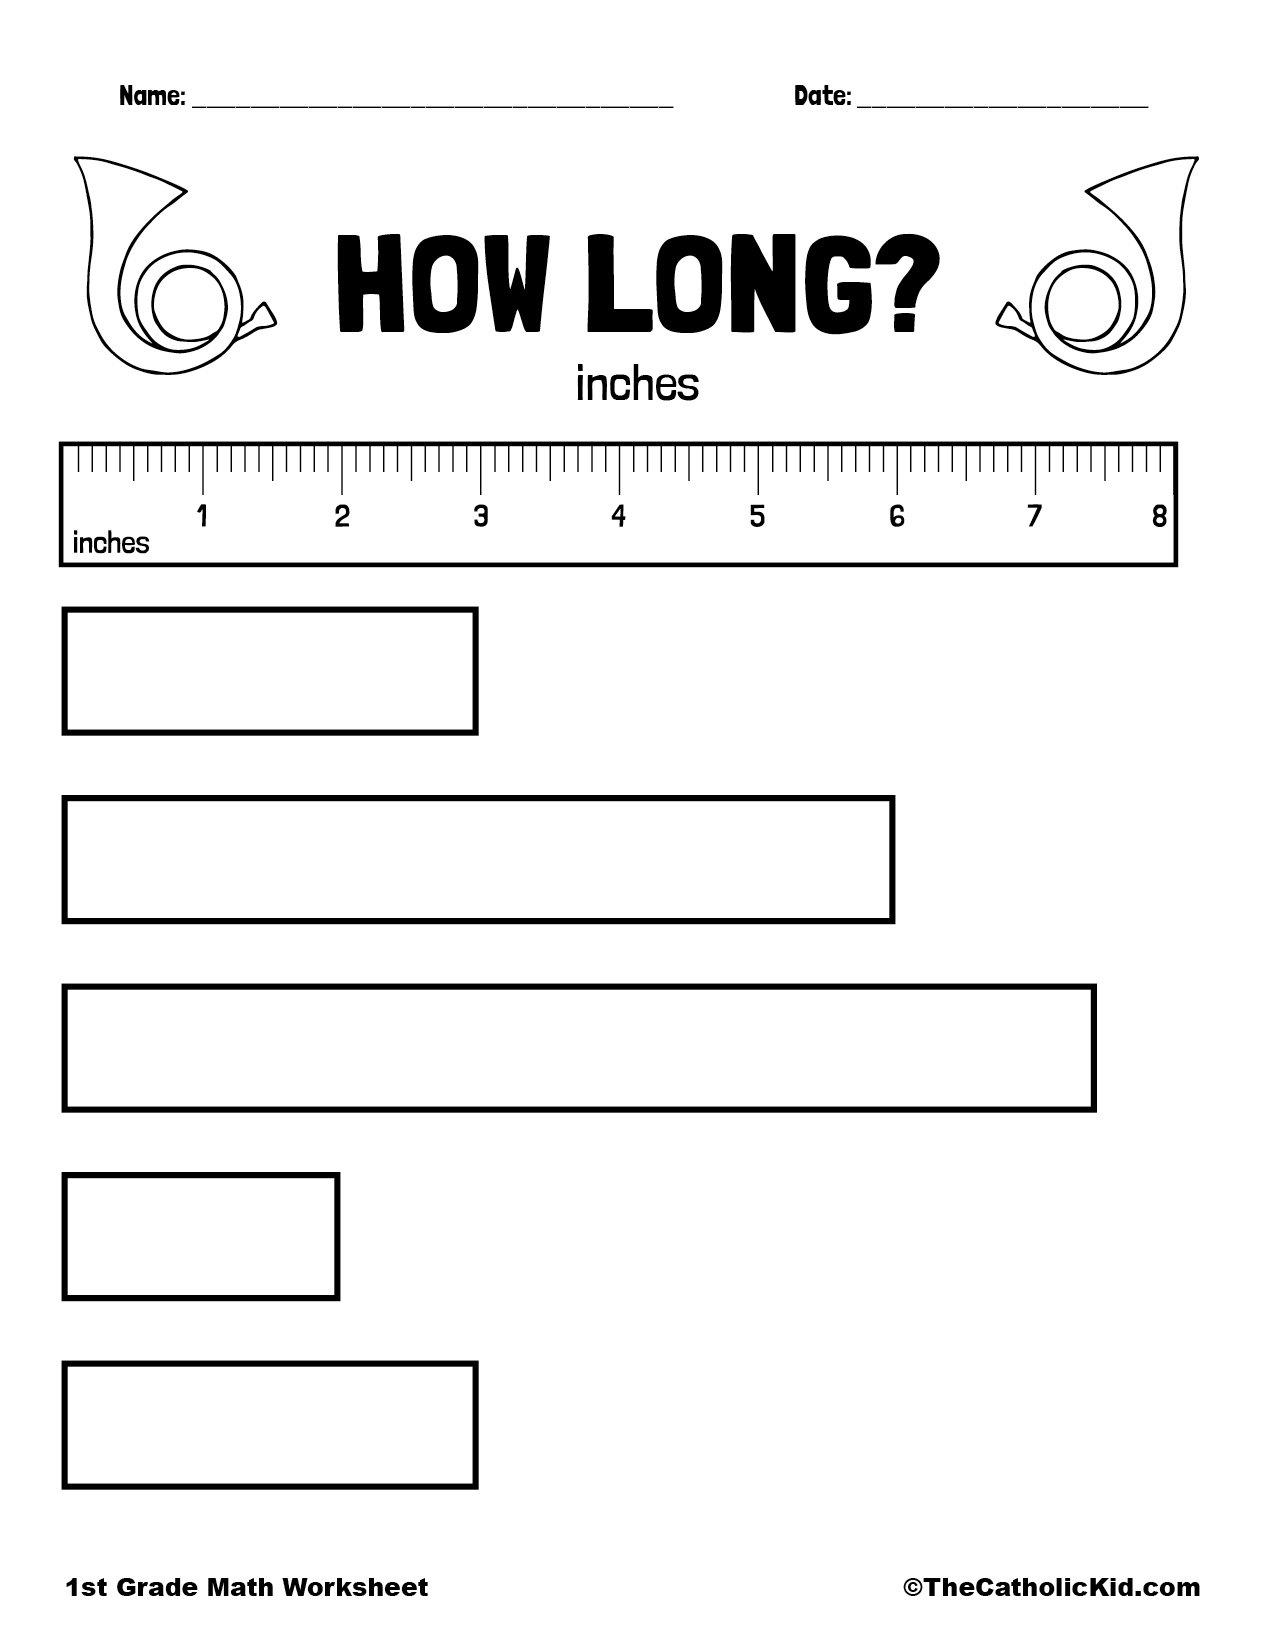 1st Grade Math Catholic Themed Worksheet Measure